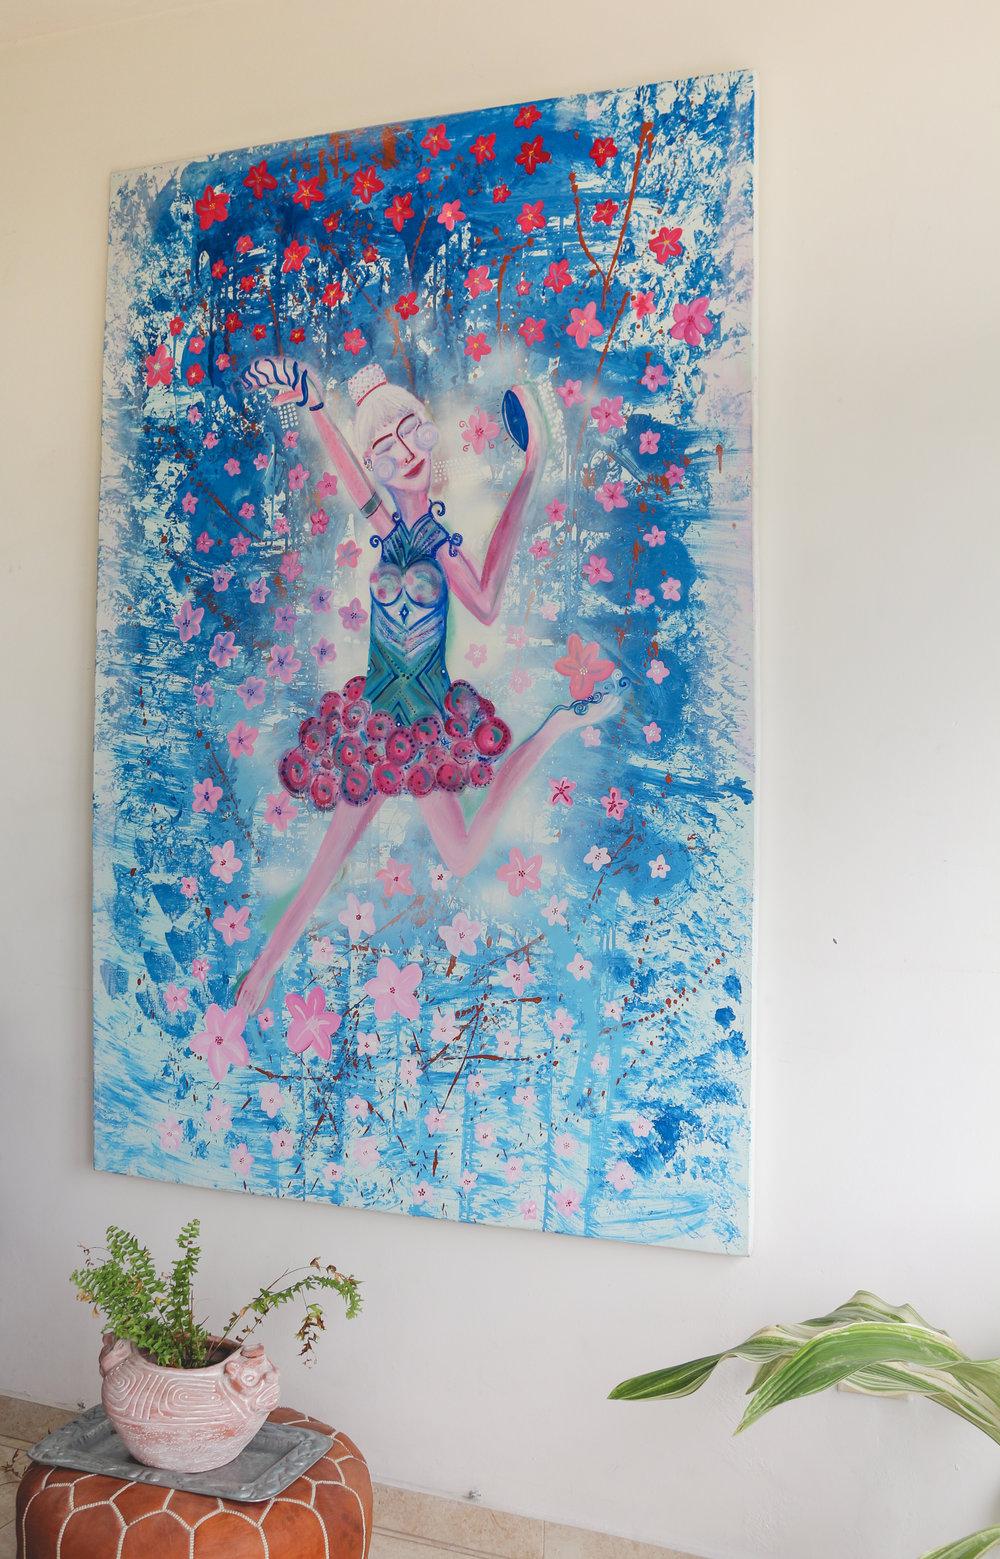 2. For Auction detail_Amanacer-4.jpg